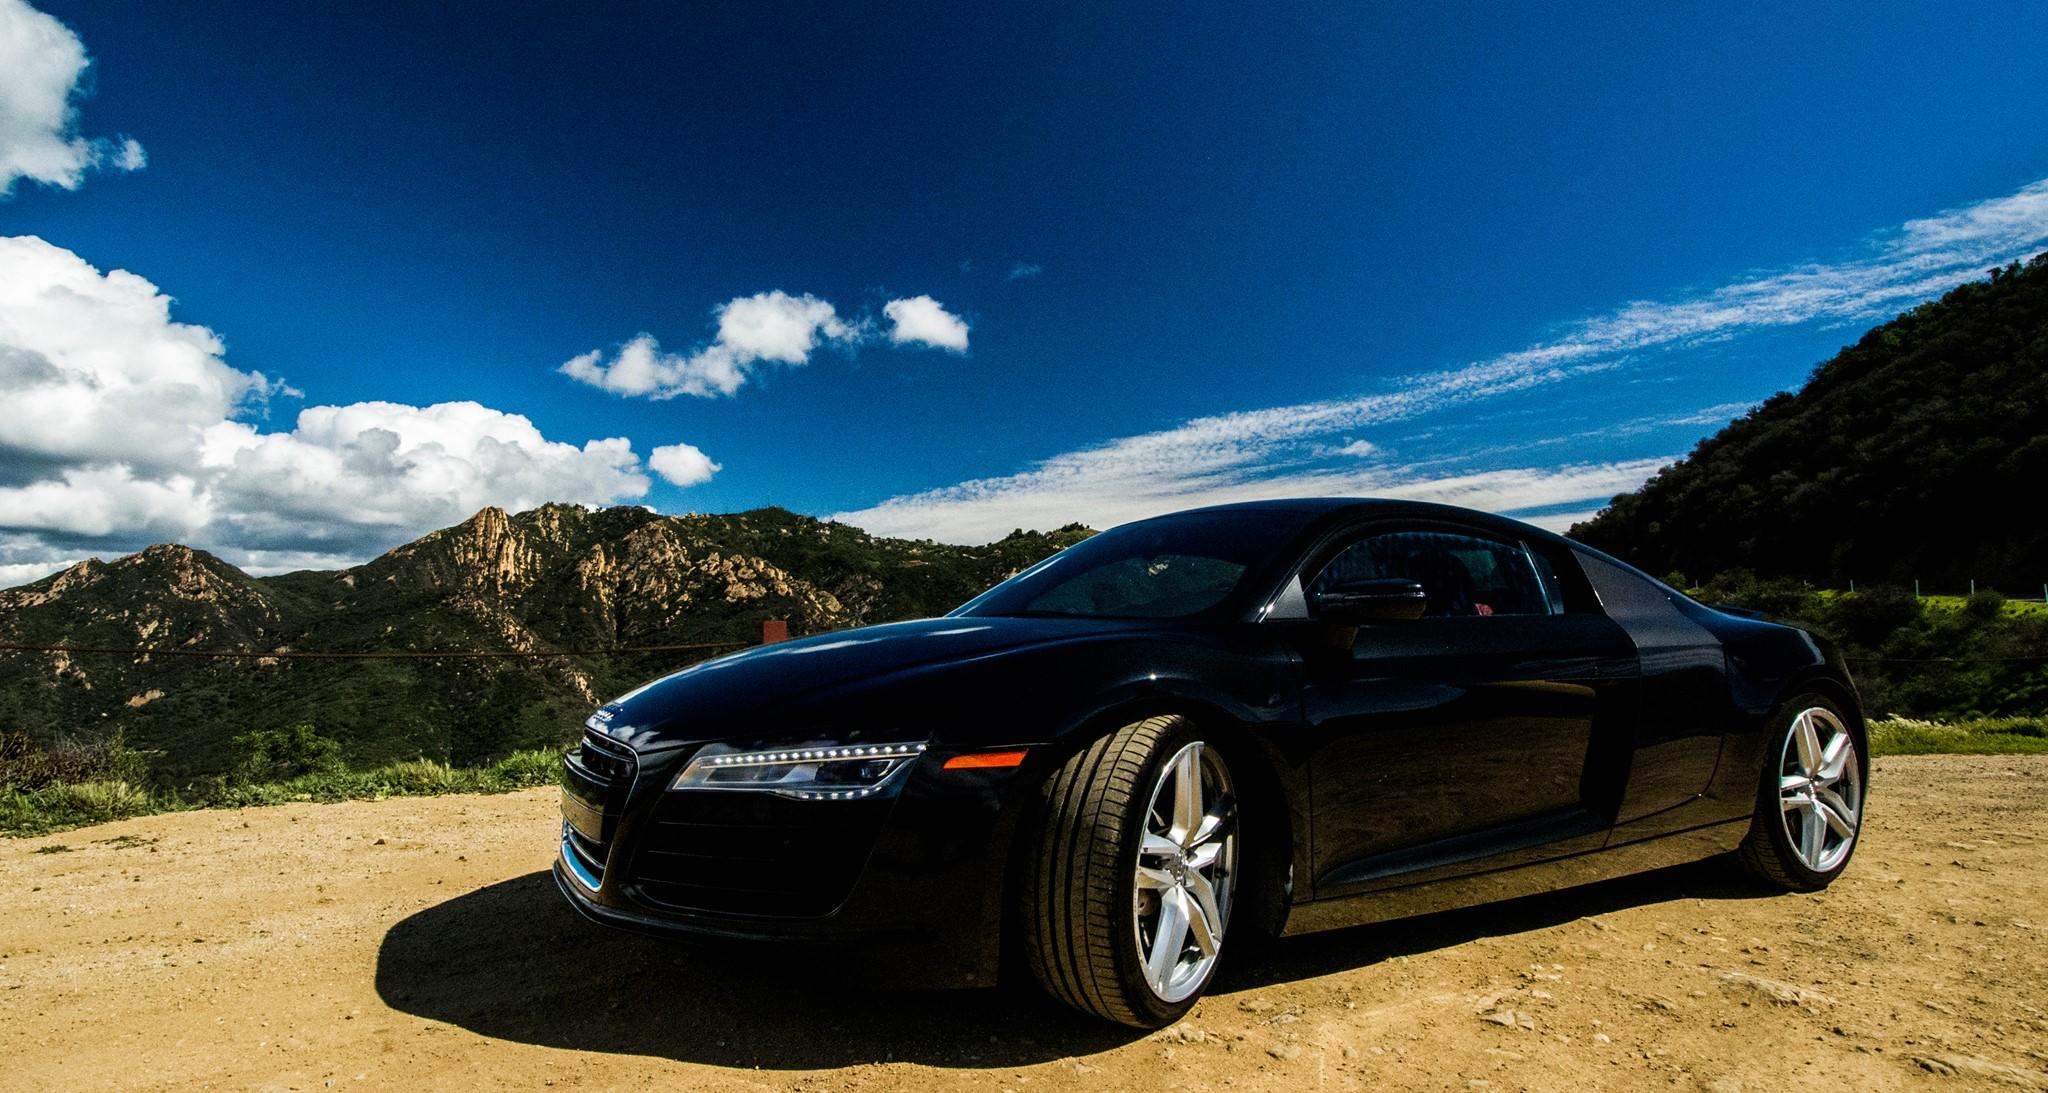 Audi R8, Santa Monica Mountains